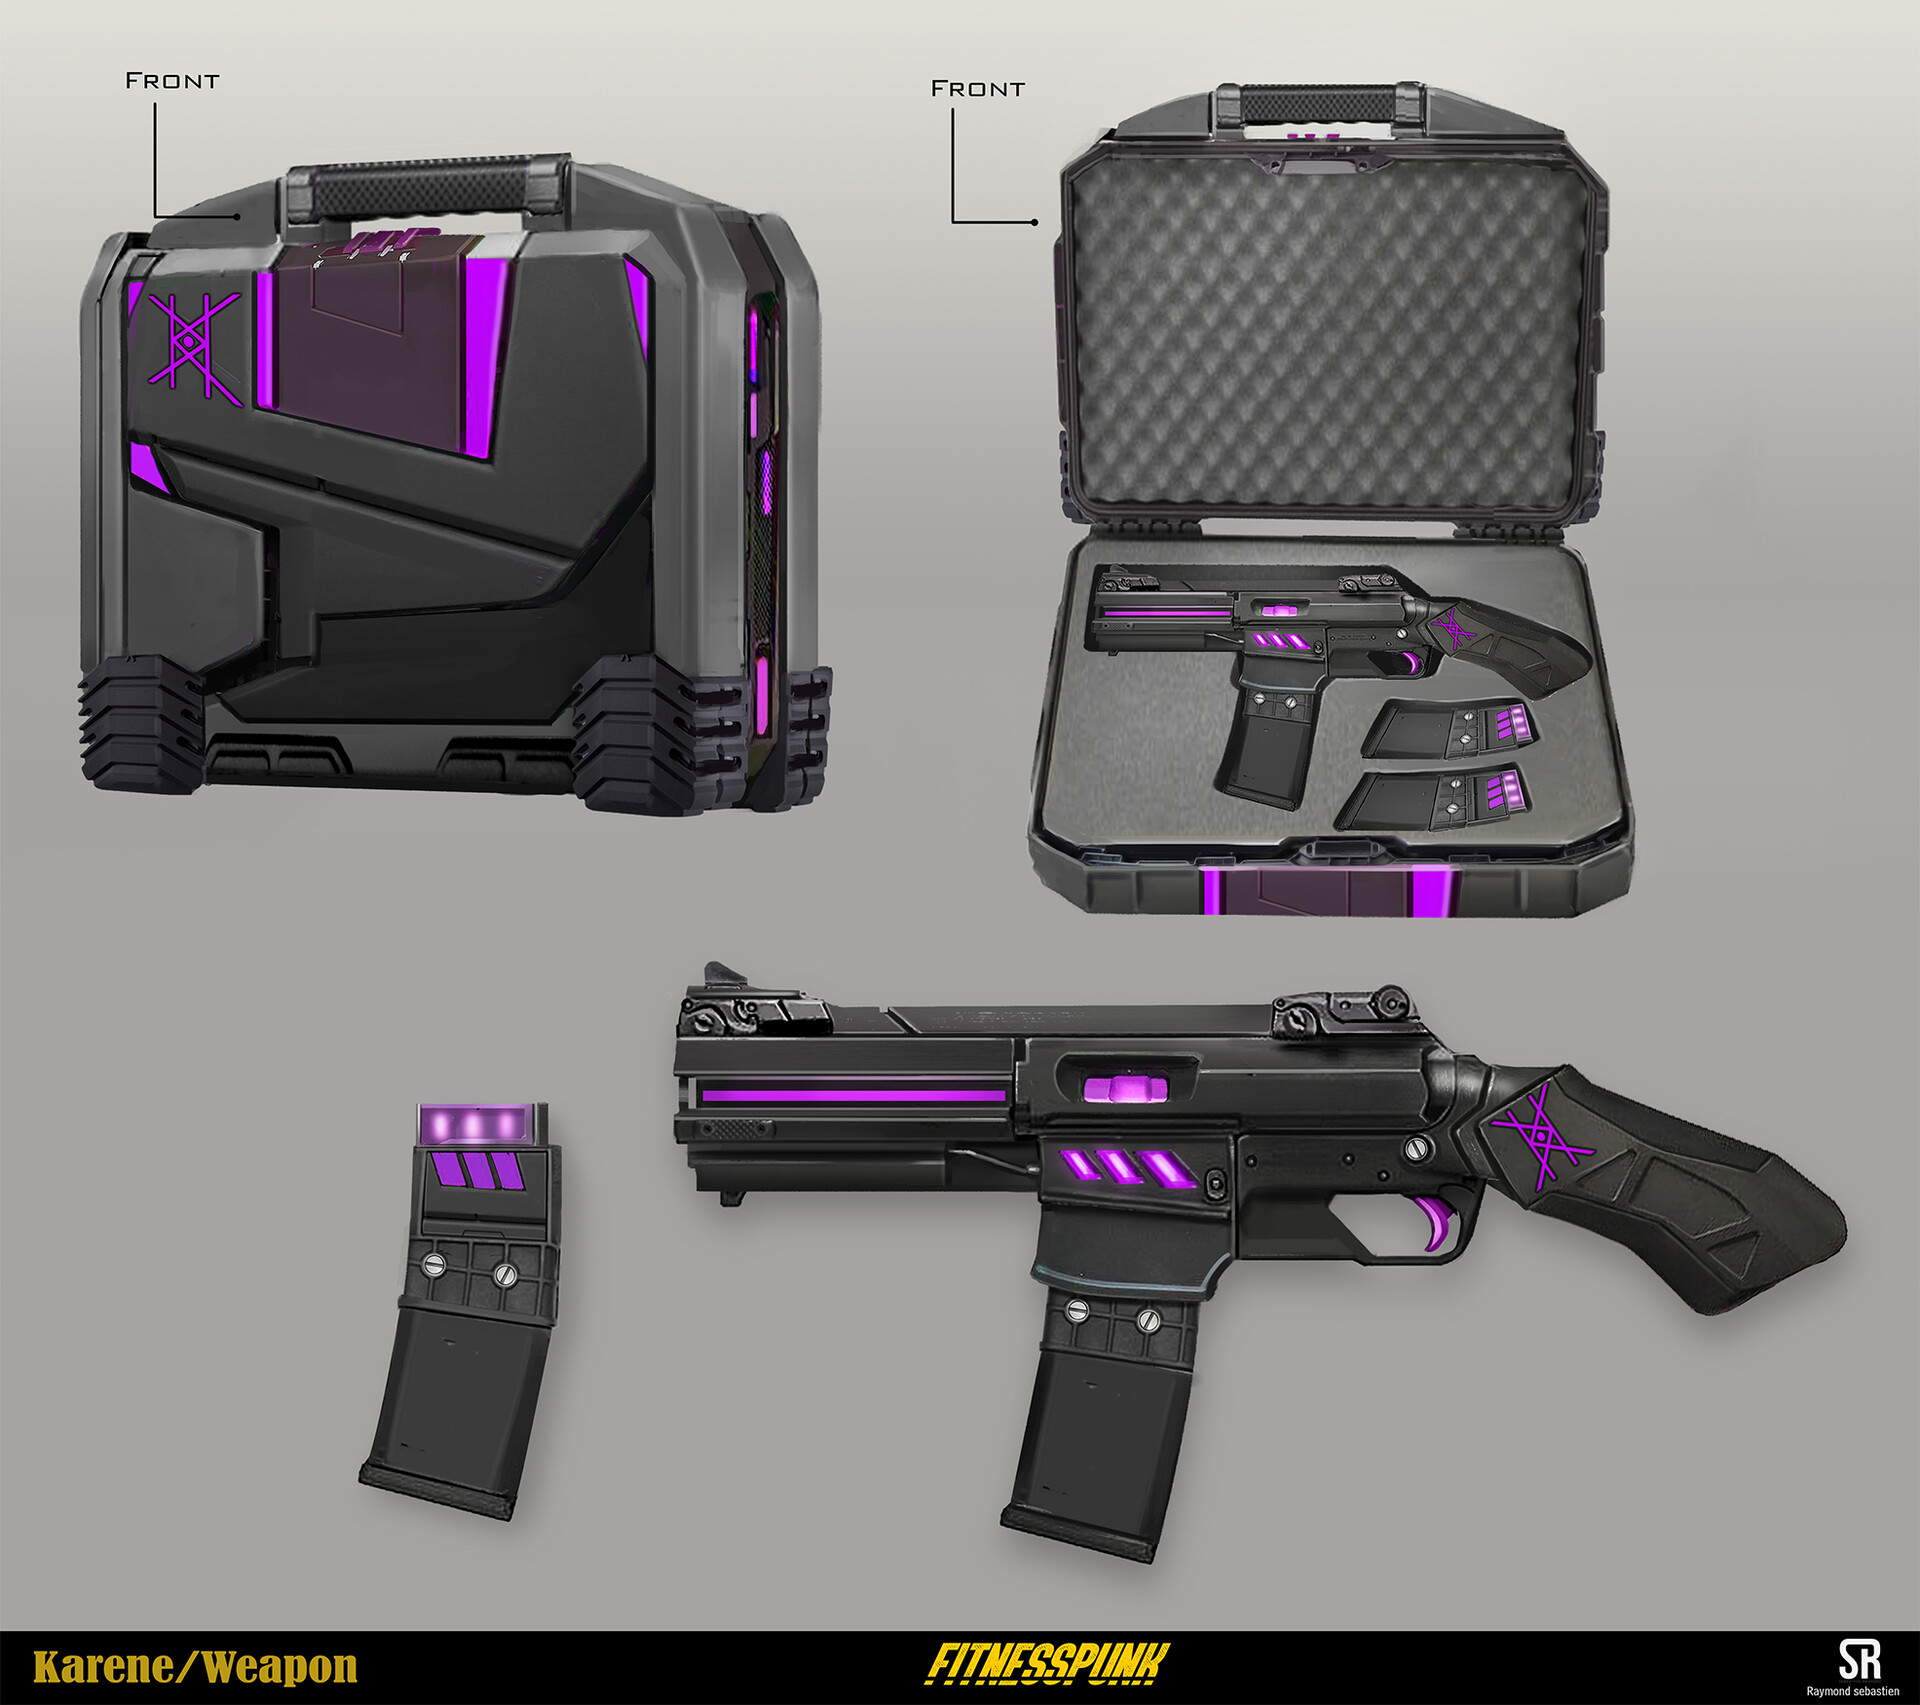 Weapon design : the shotgun